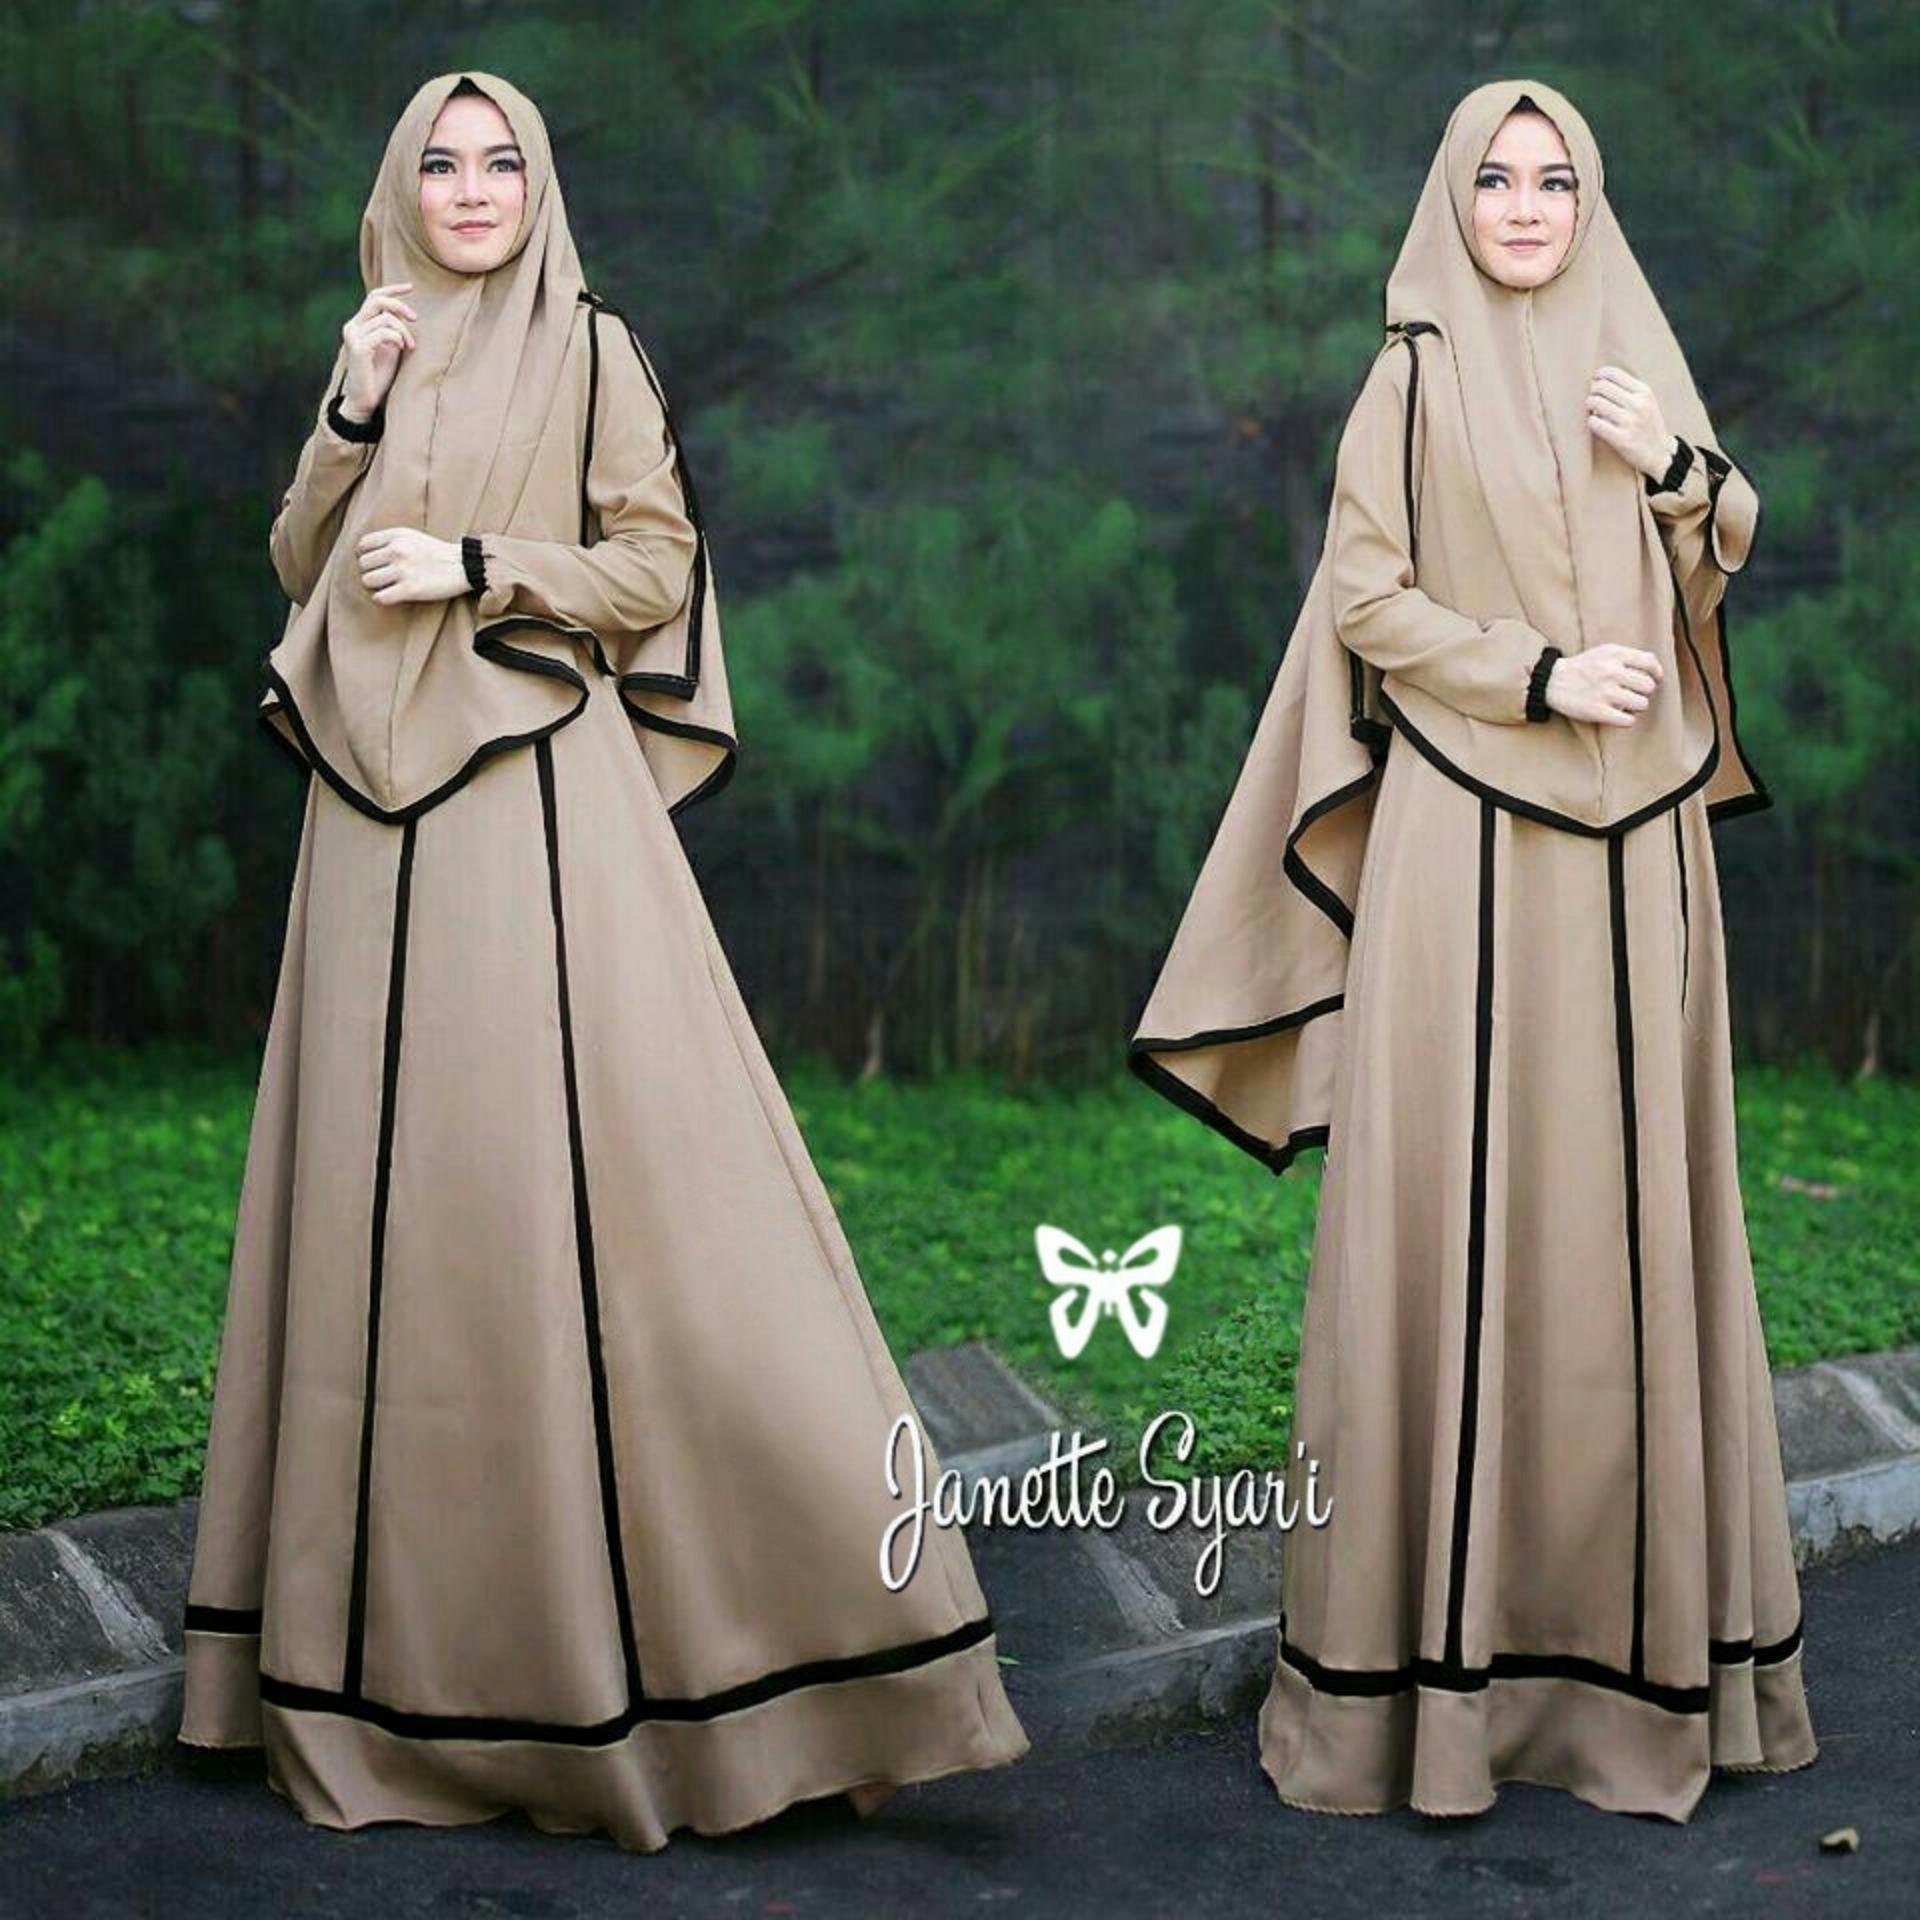 Beli Baju Gamis Wanita Jumbo Polos L Xxxl Bahan Kaos Import 9621 Syari Muslim Modern Gina Fashionable Uc Dress Imelda Fashion Maxi